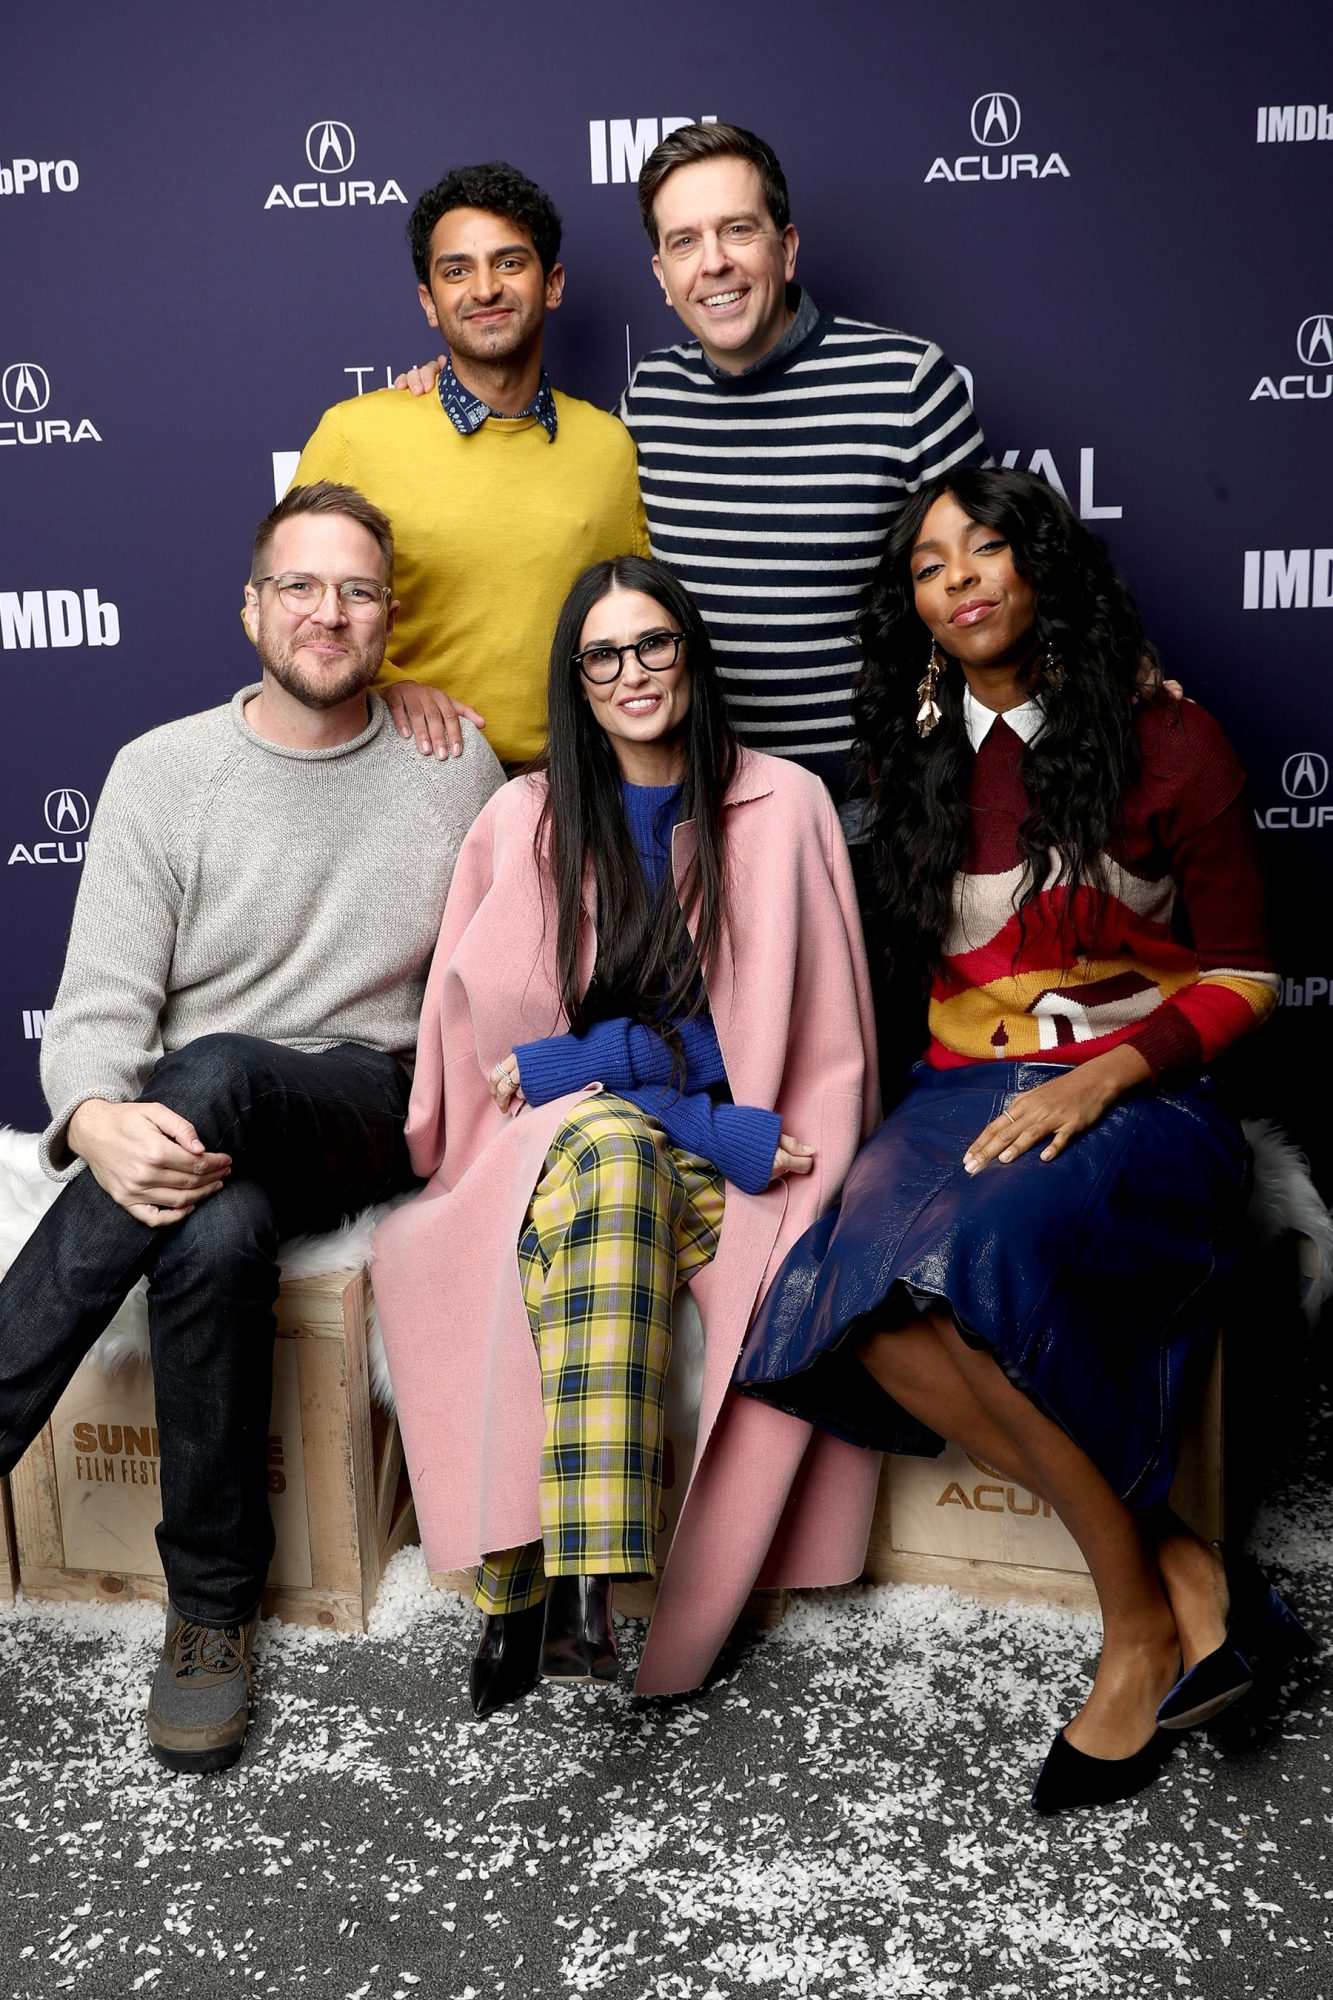 The IMDb Studio At Acura Festival Village On Location At The 2019 Sundance Film Festival - Day 4